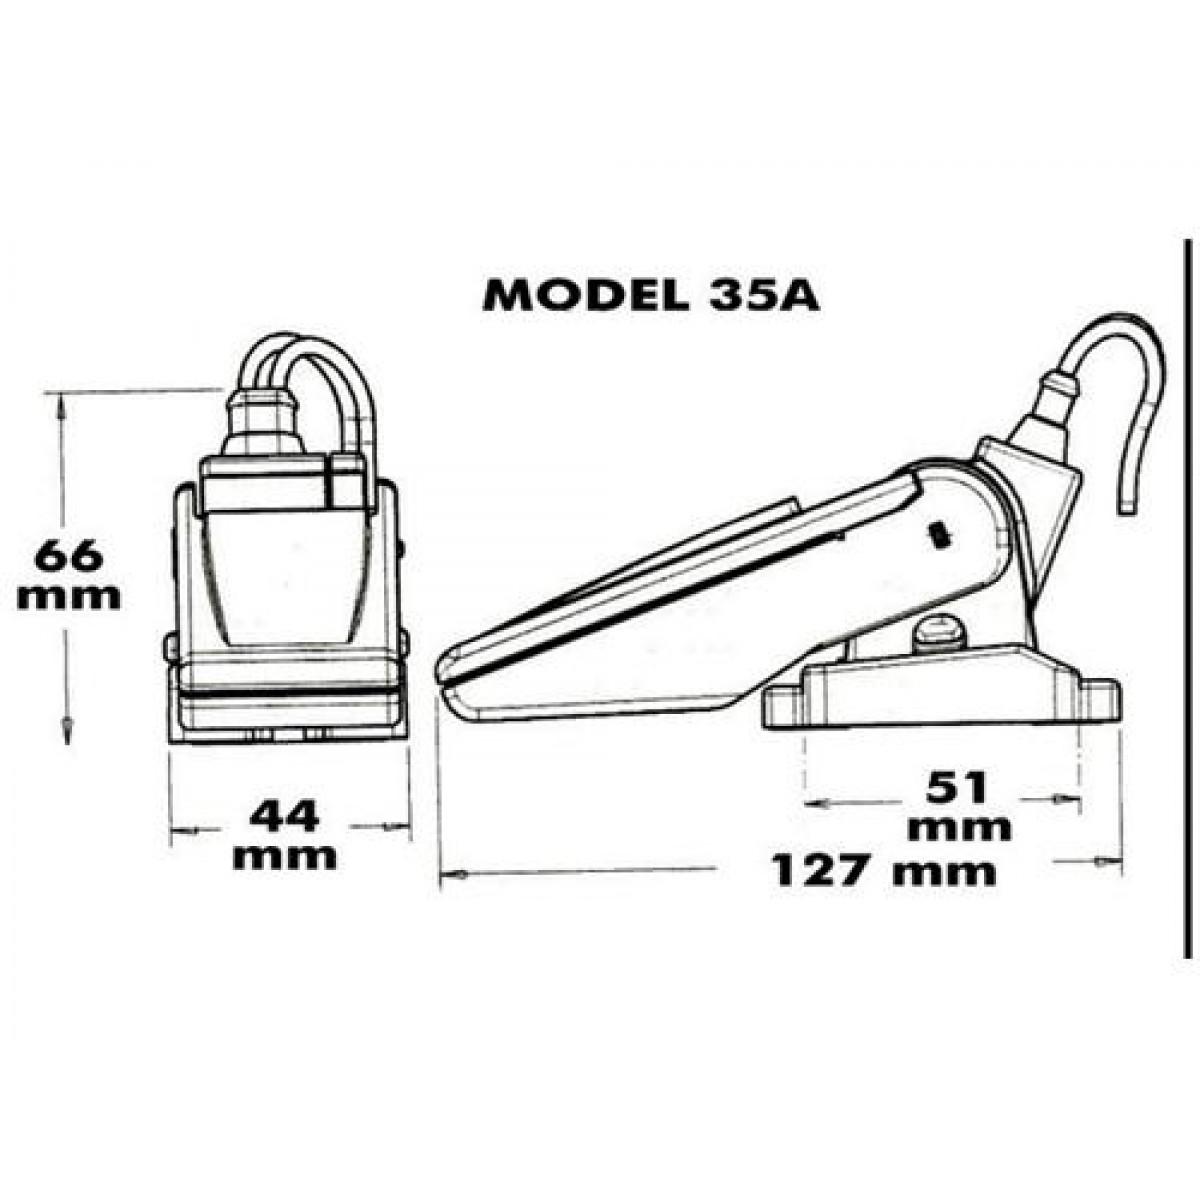 automation device rule for bilge pumps - electricity